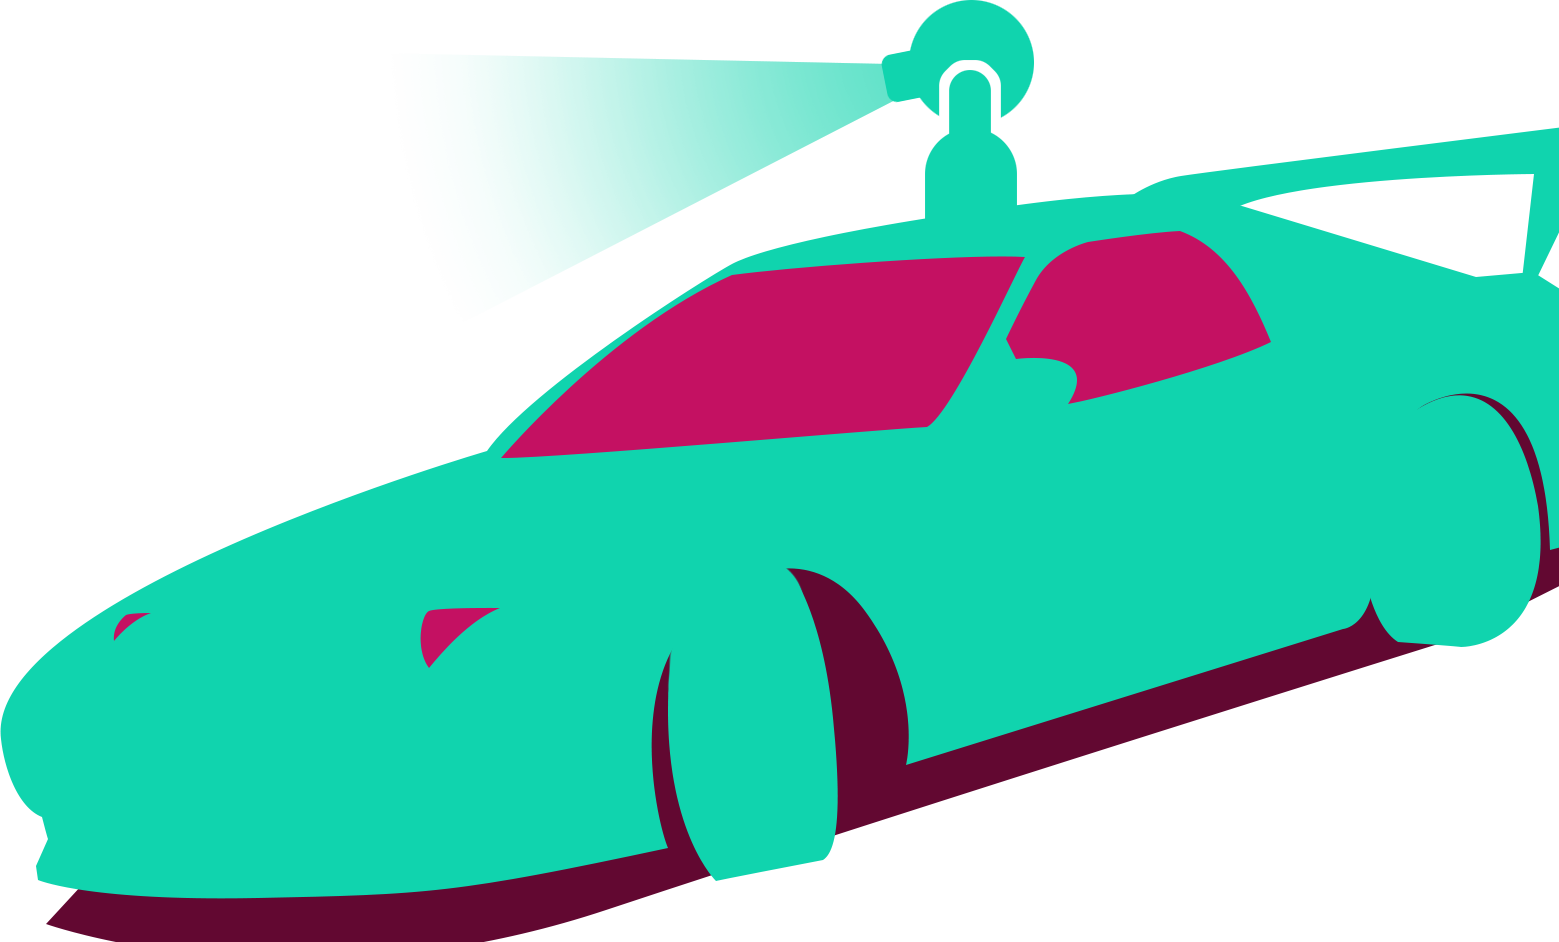 Teal self-driving race car drifting